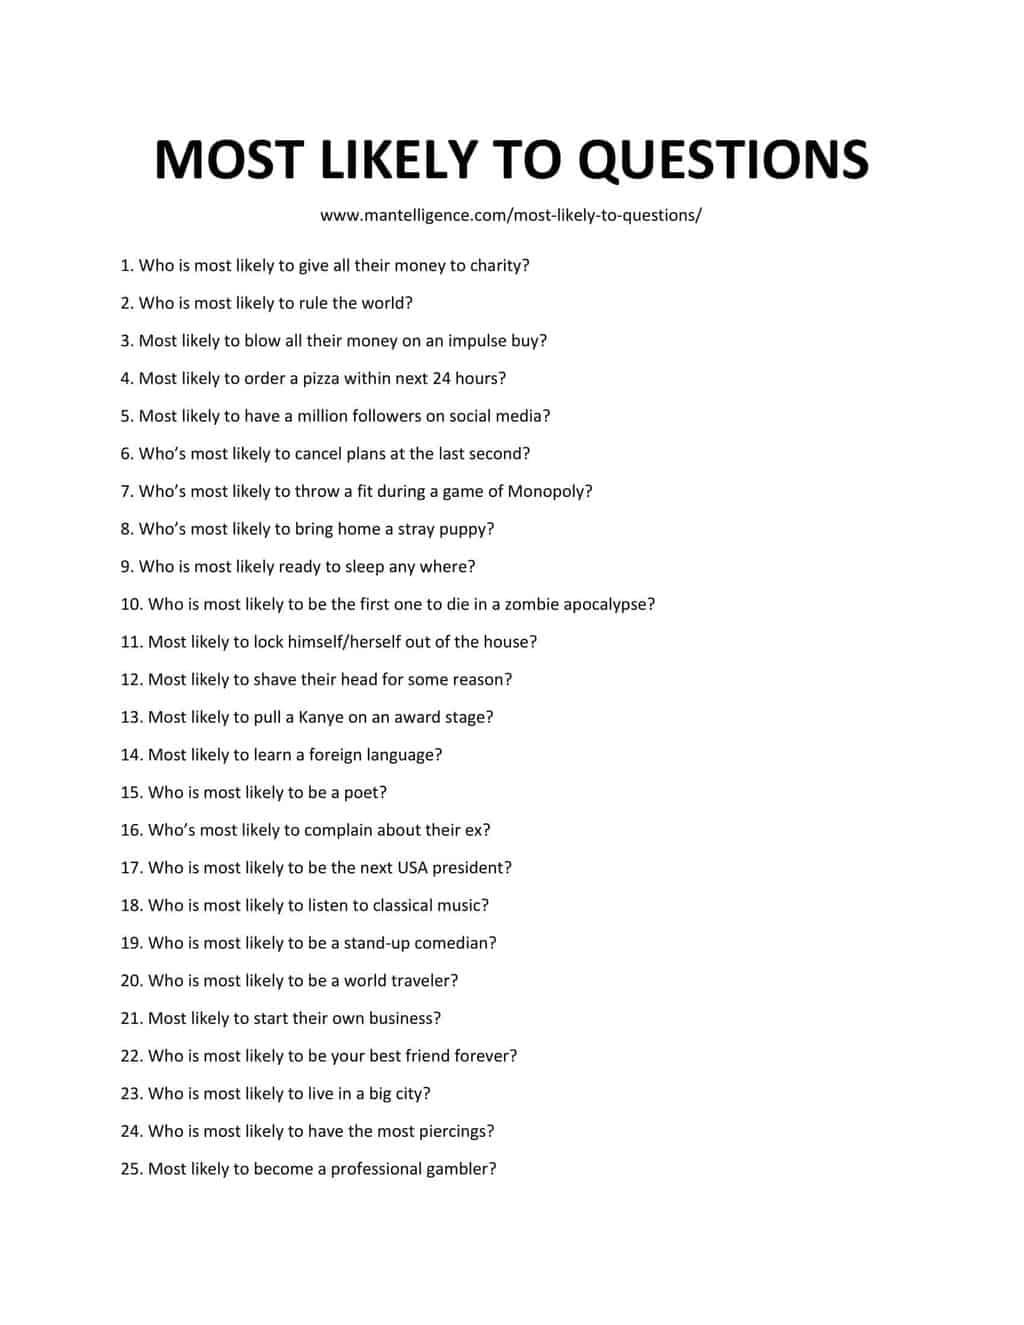 Paranoia Questions Adults : paranoia, questions, adults, Likely, Questions, Questions!